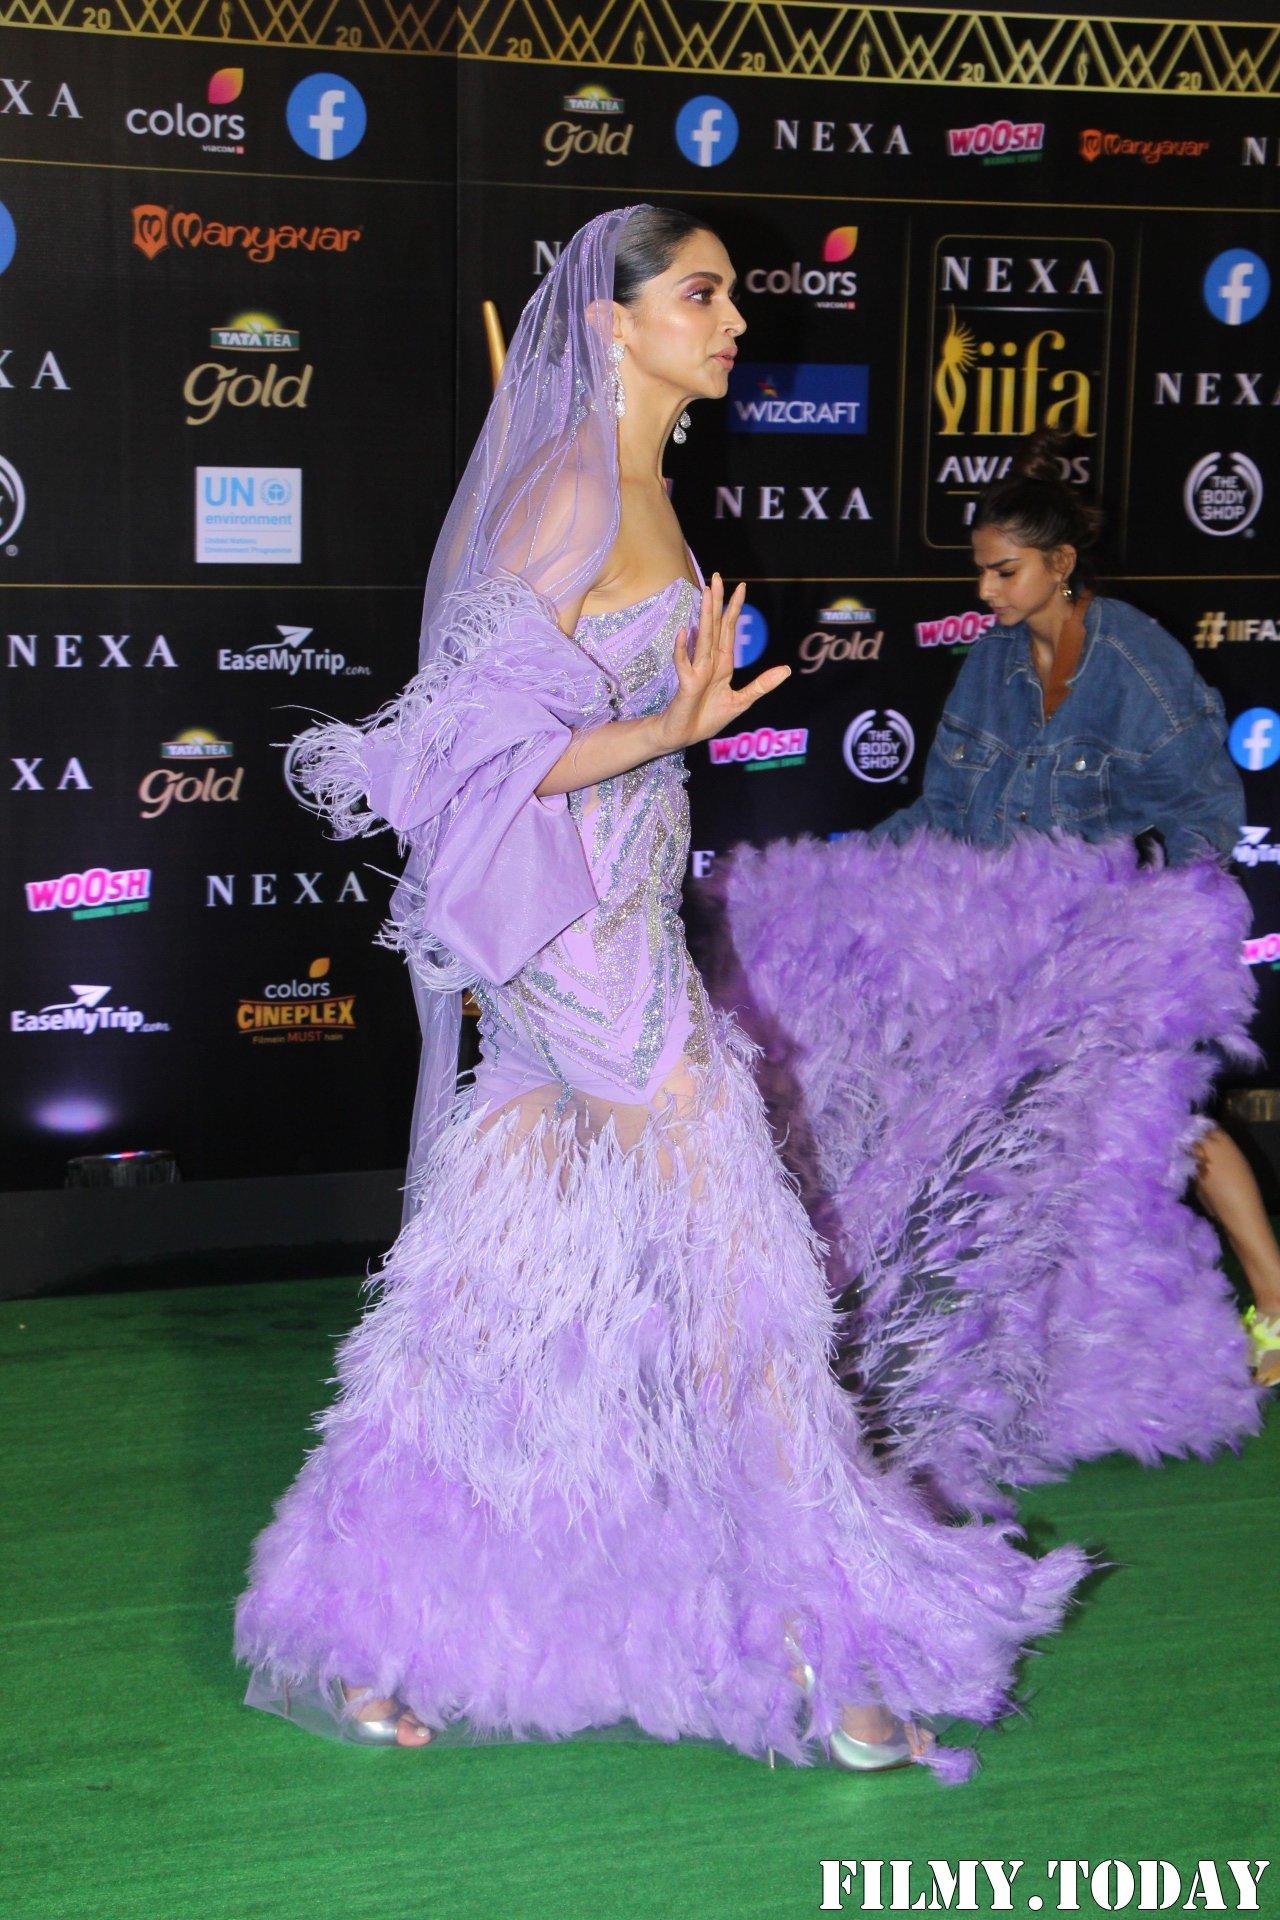 Deepika Padukone - Photos: Celebs At The Green Carpet Of The IIFA Rocks 2019 | Picture 1683582